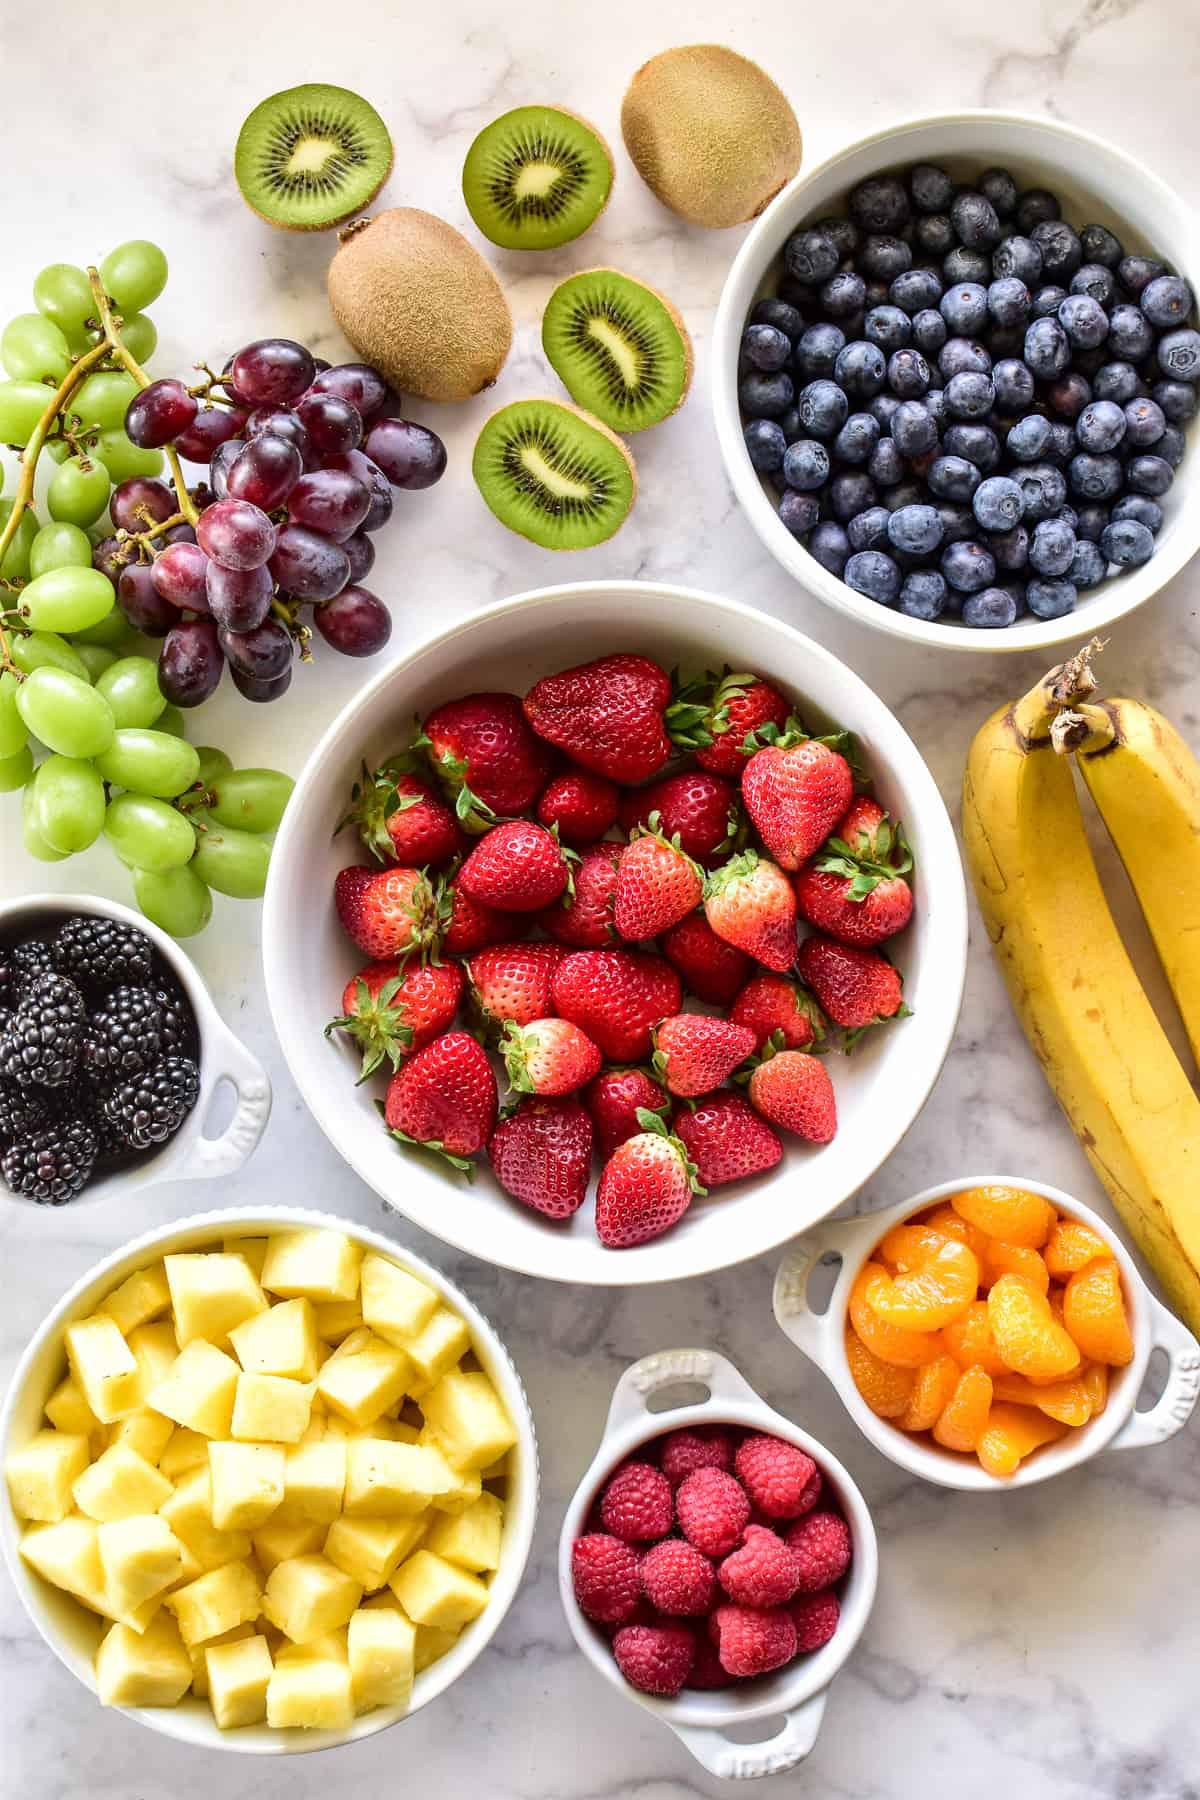 Fruit Salad ingredients on a marble slab